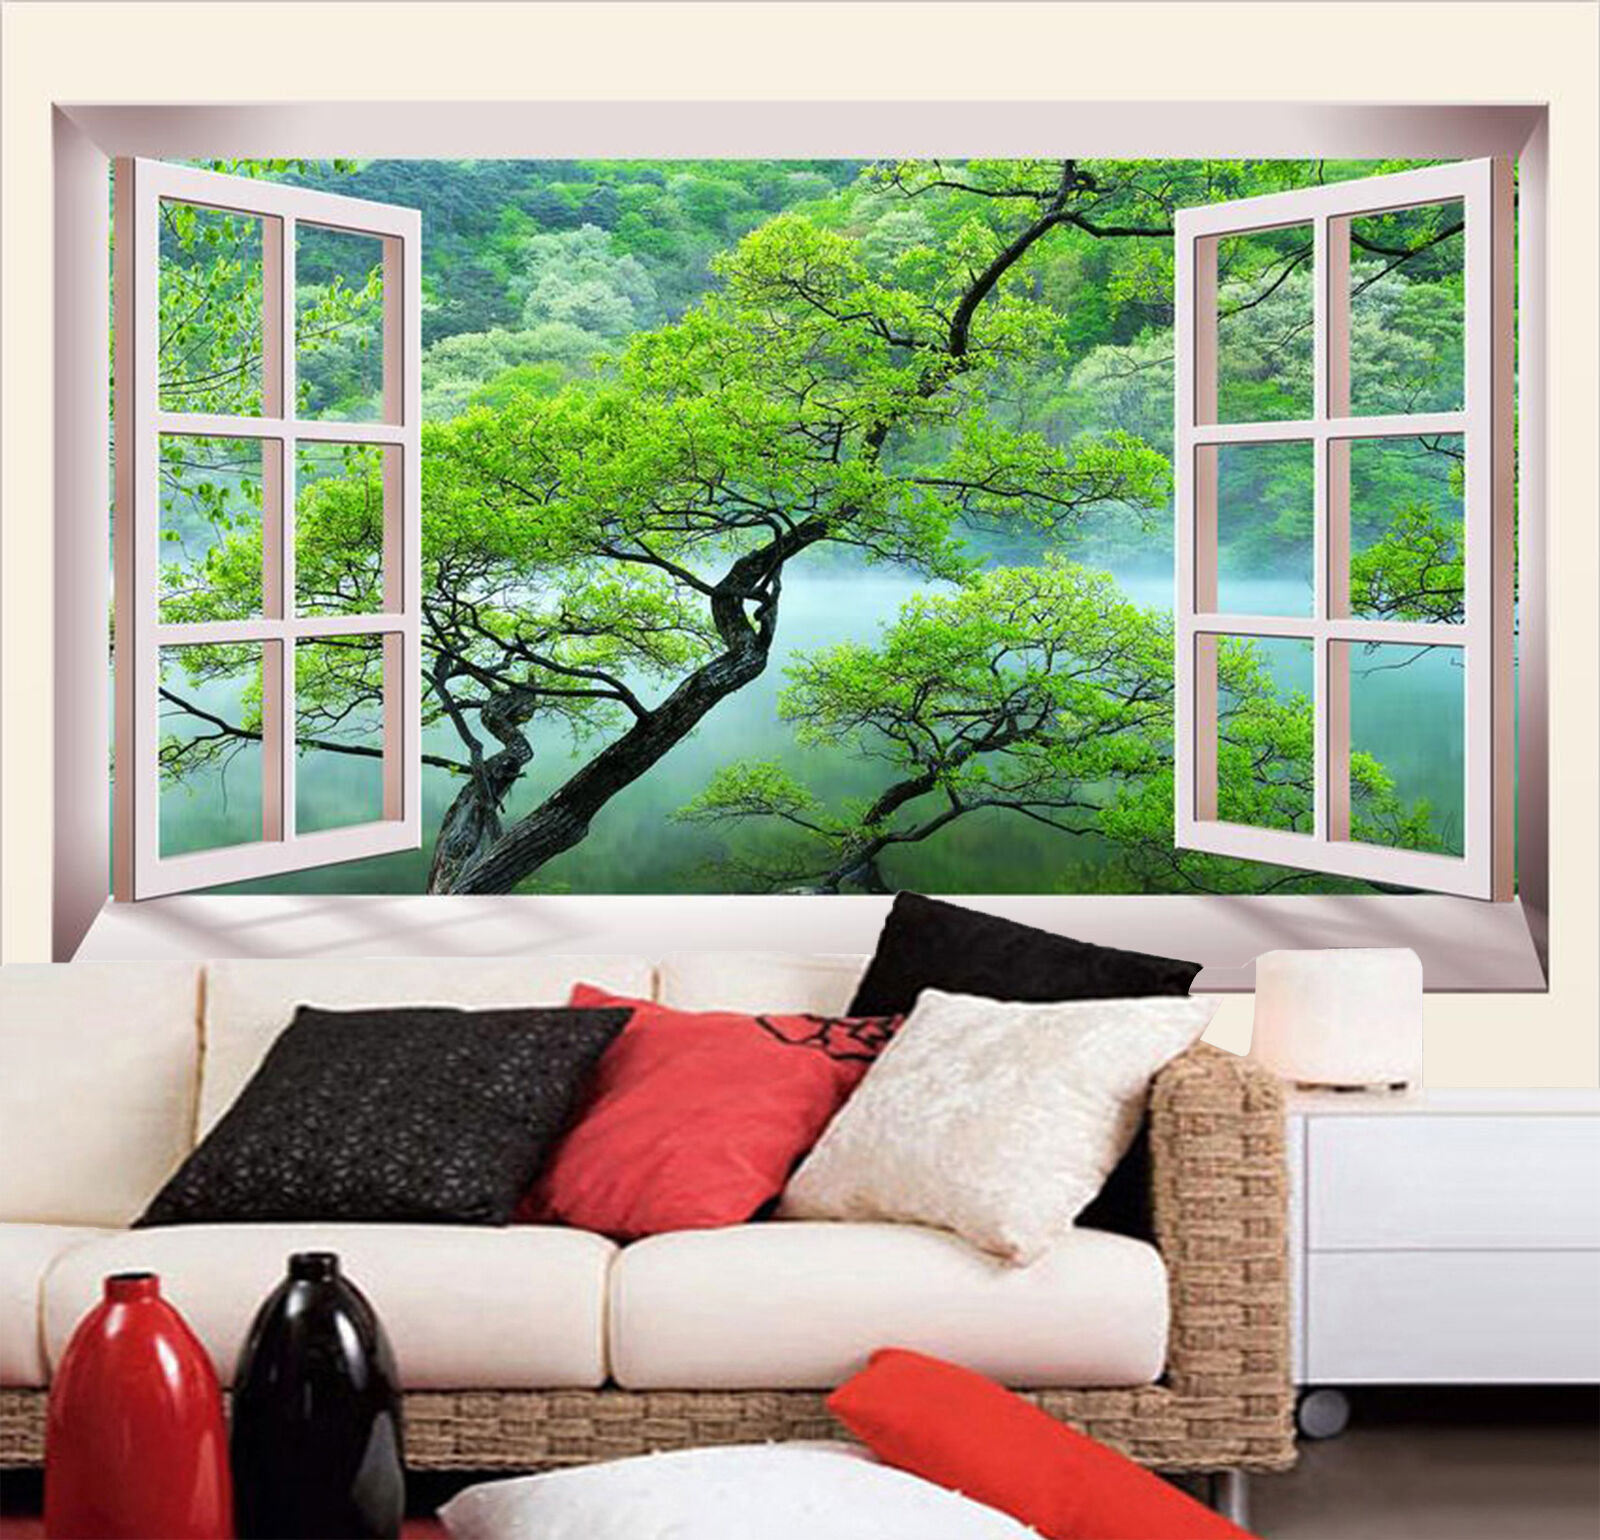 3D Window Lakeside Tree 458 Wallpaper Decal Dercor Home Kids Nursery Mural Home